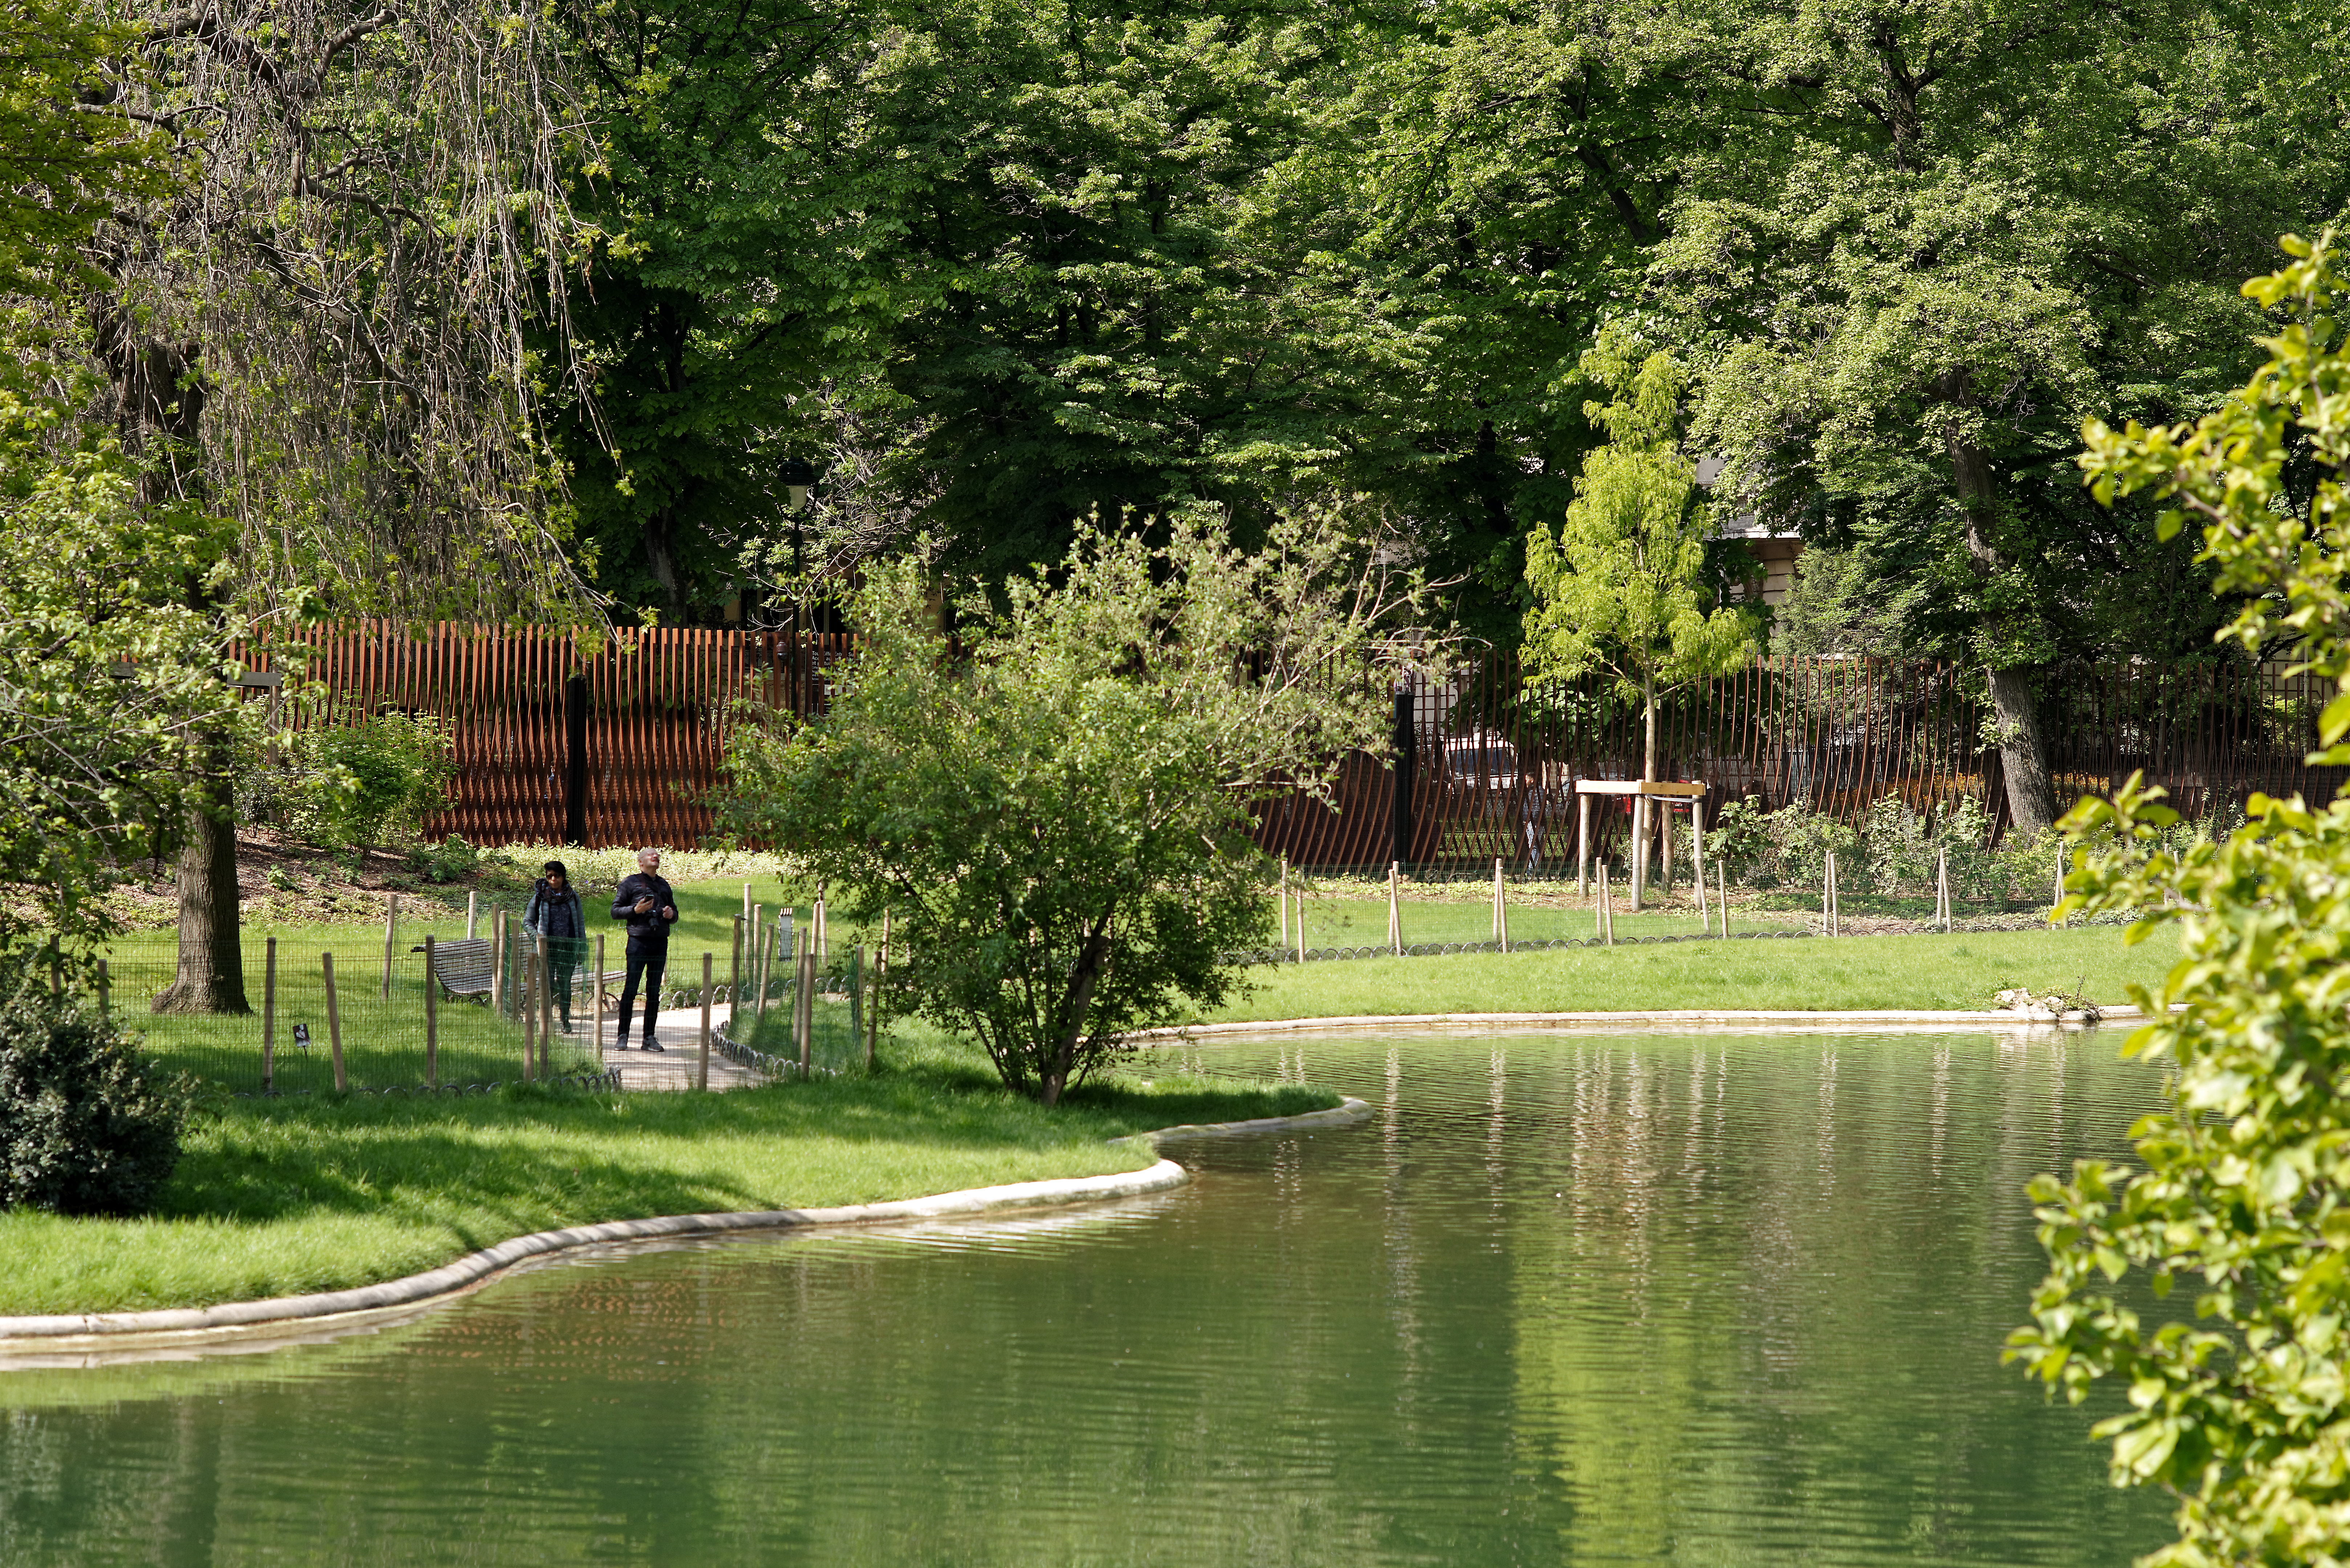 <p>Tuin en hek. Beeld David Boureau</p>